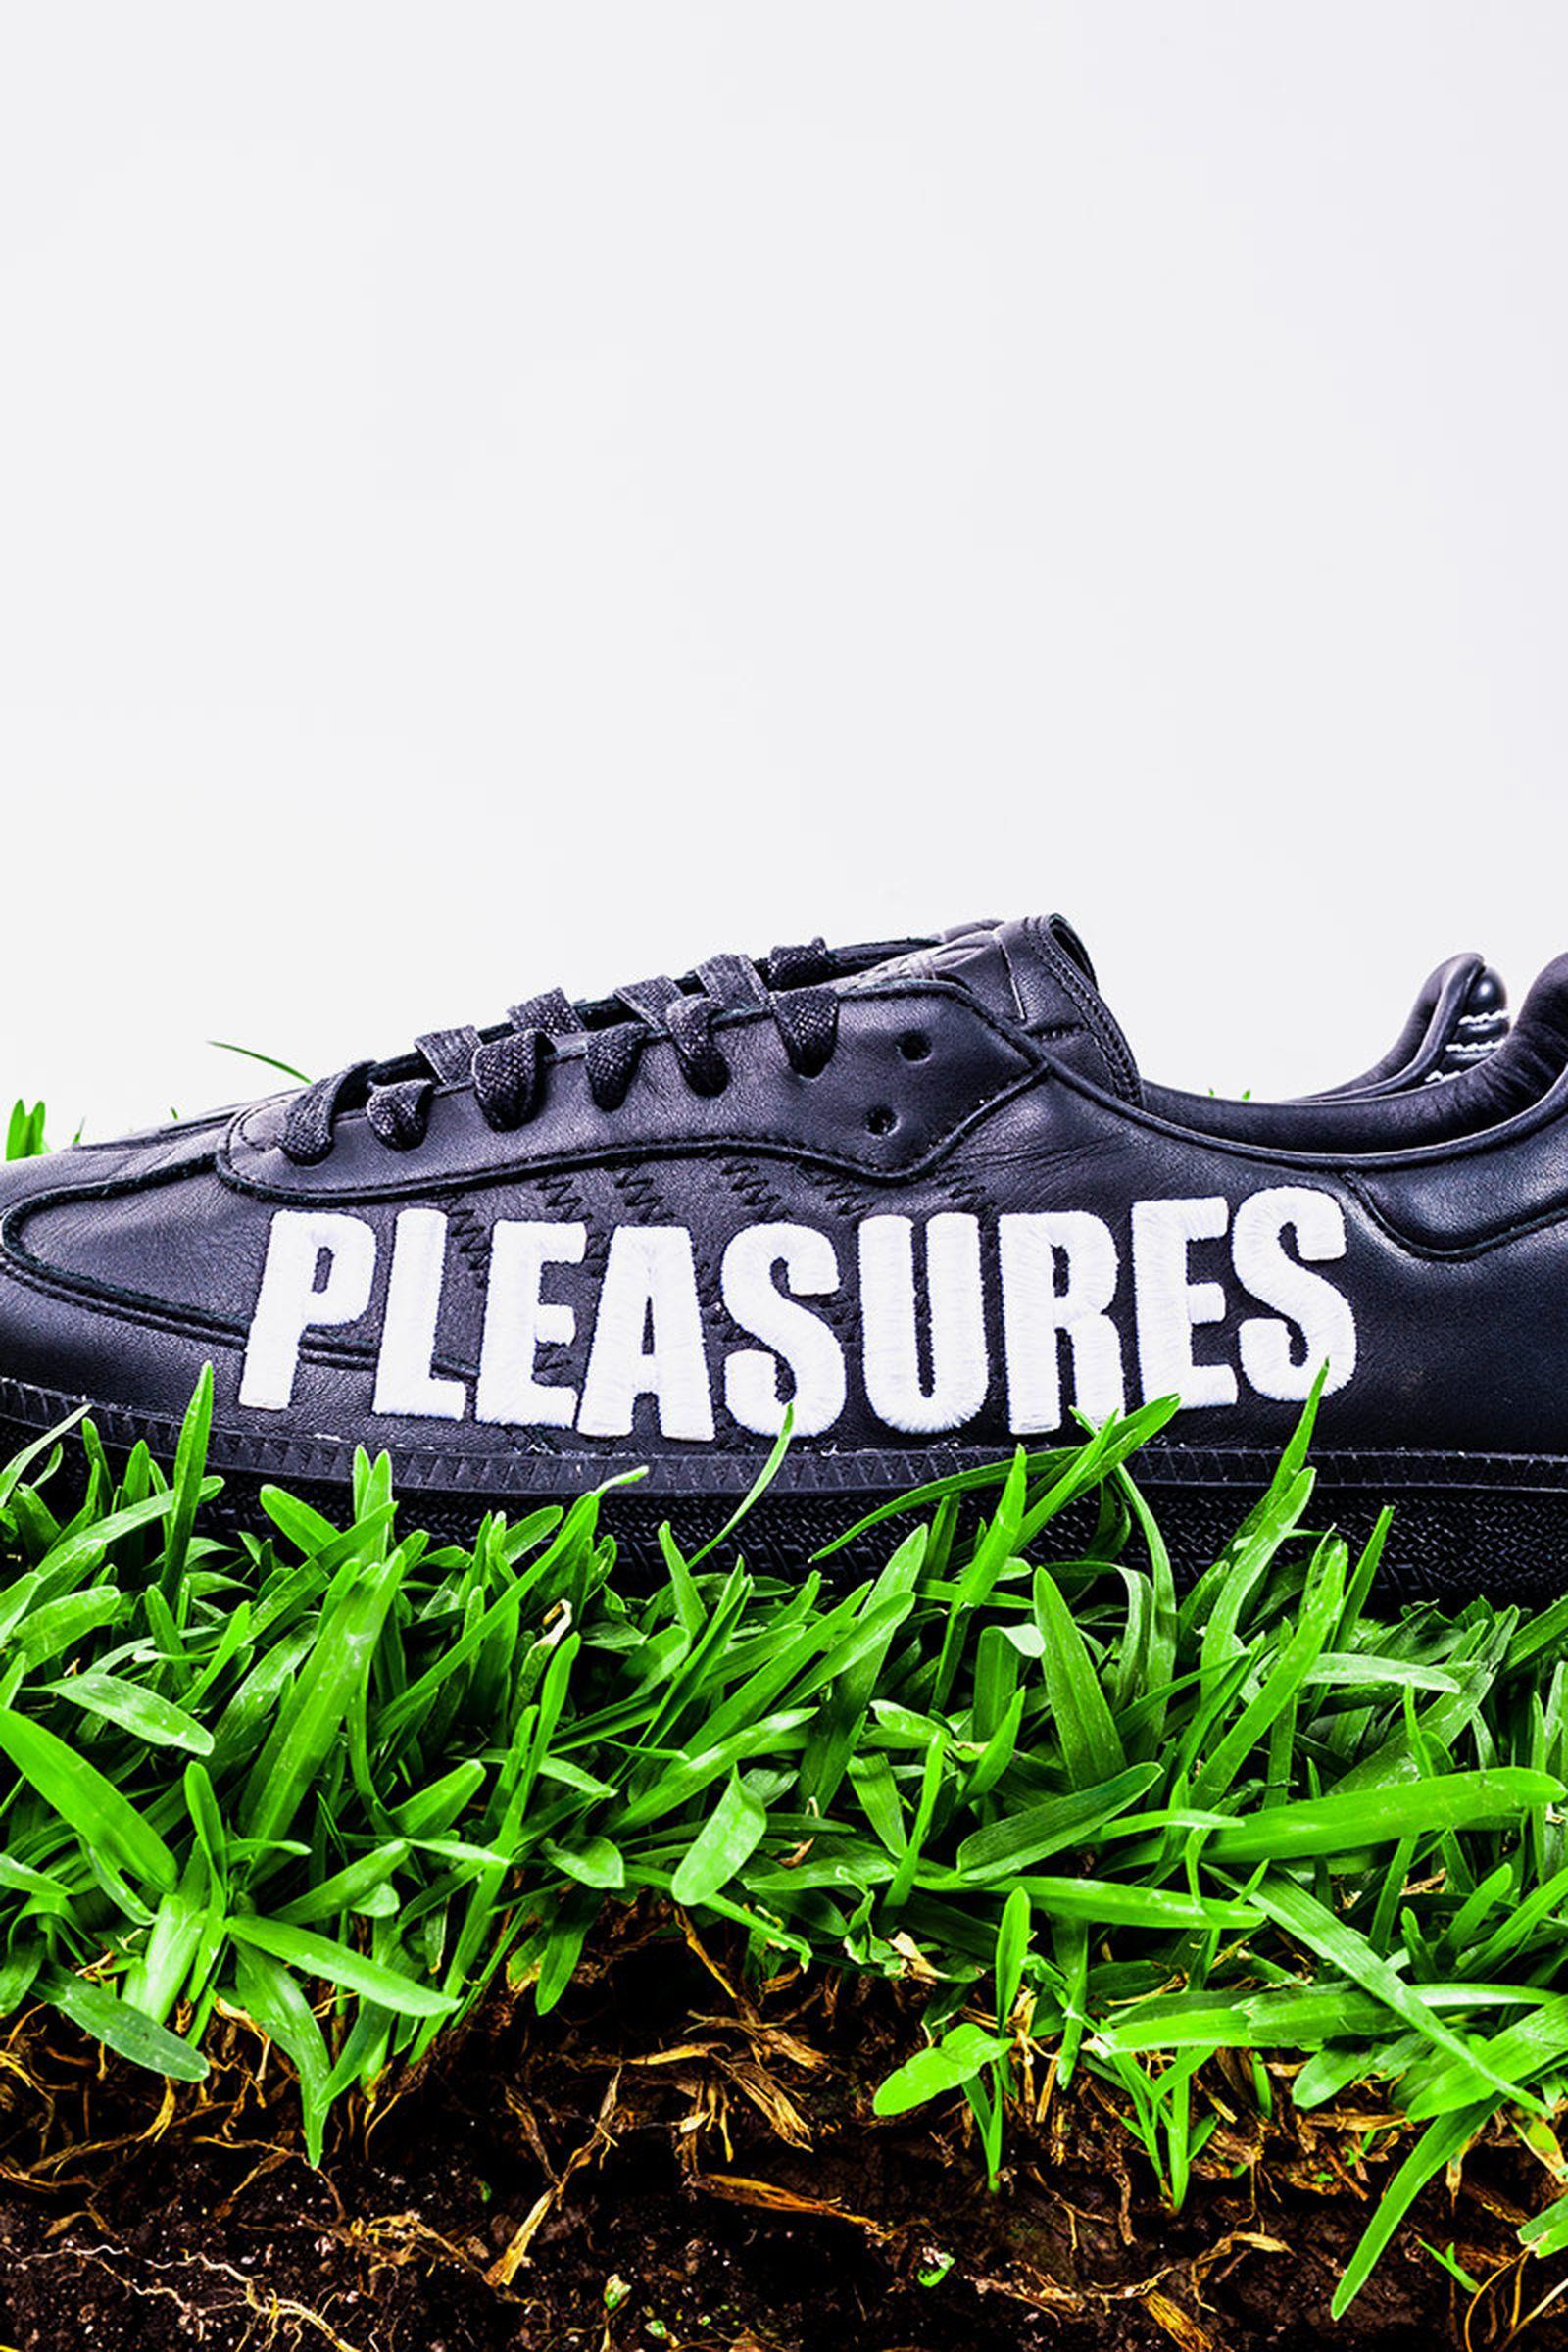 pleasures adidas samba release date price Pleasures x adidas